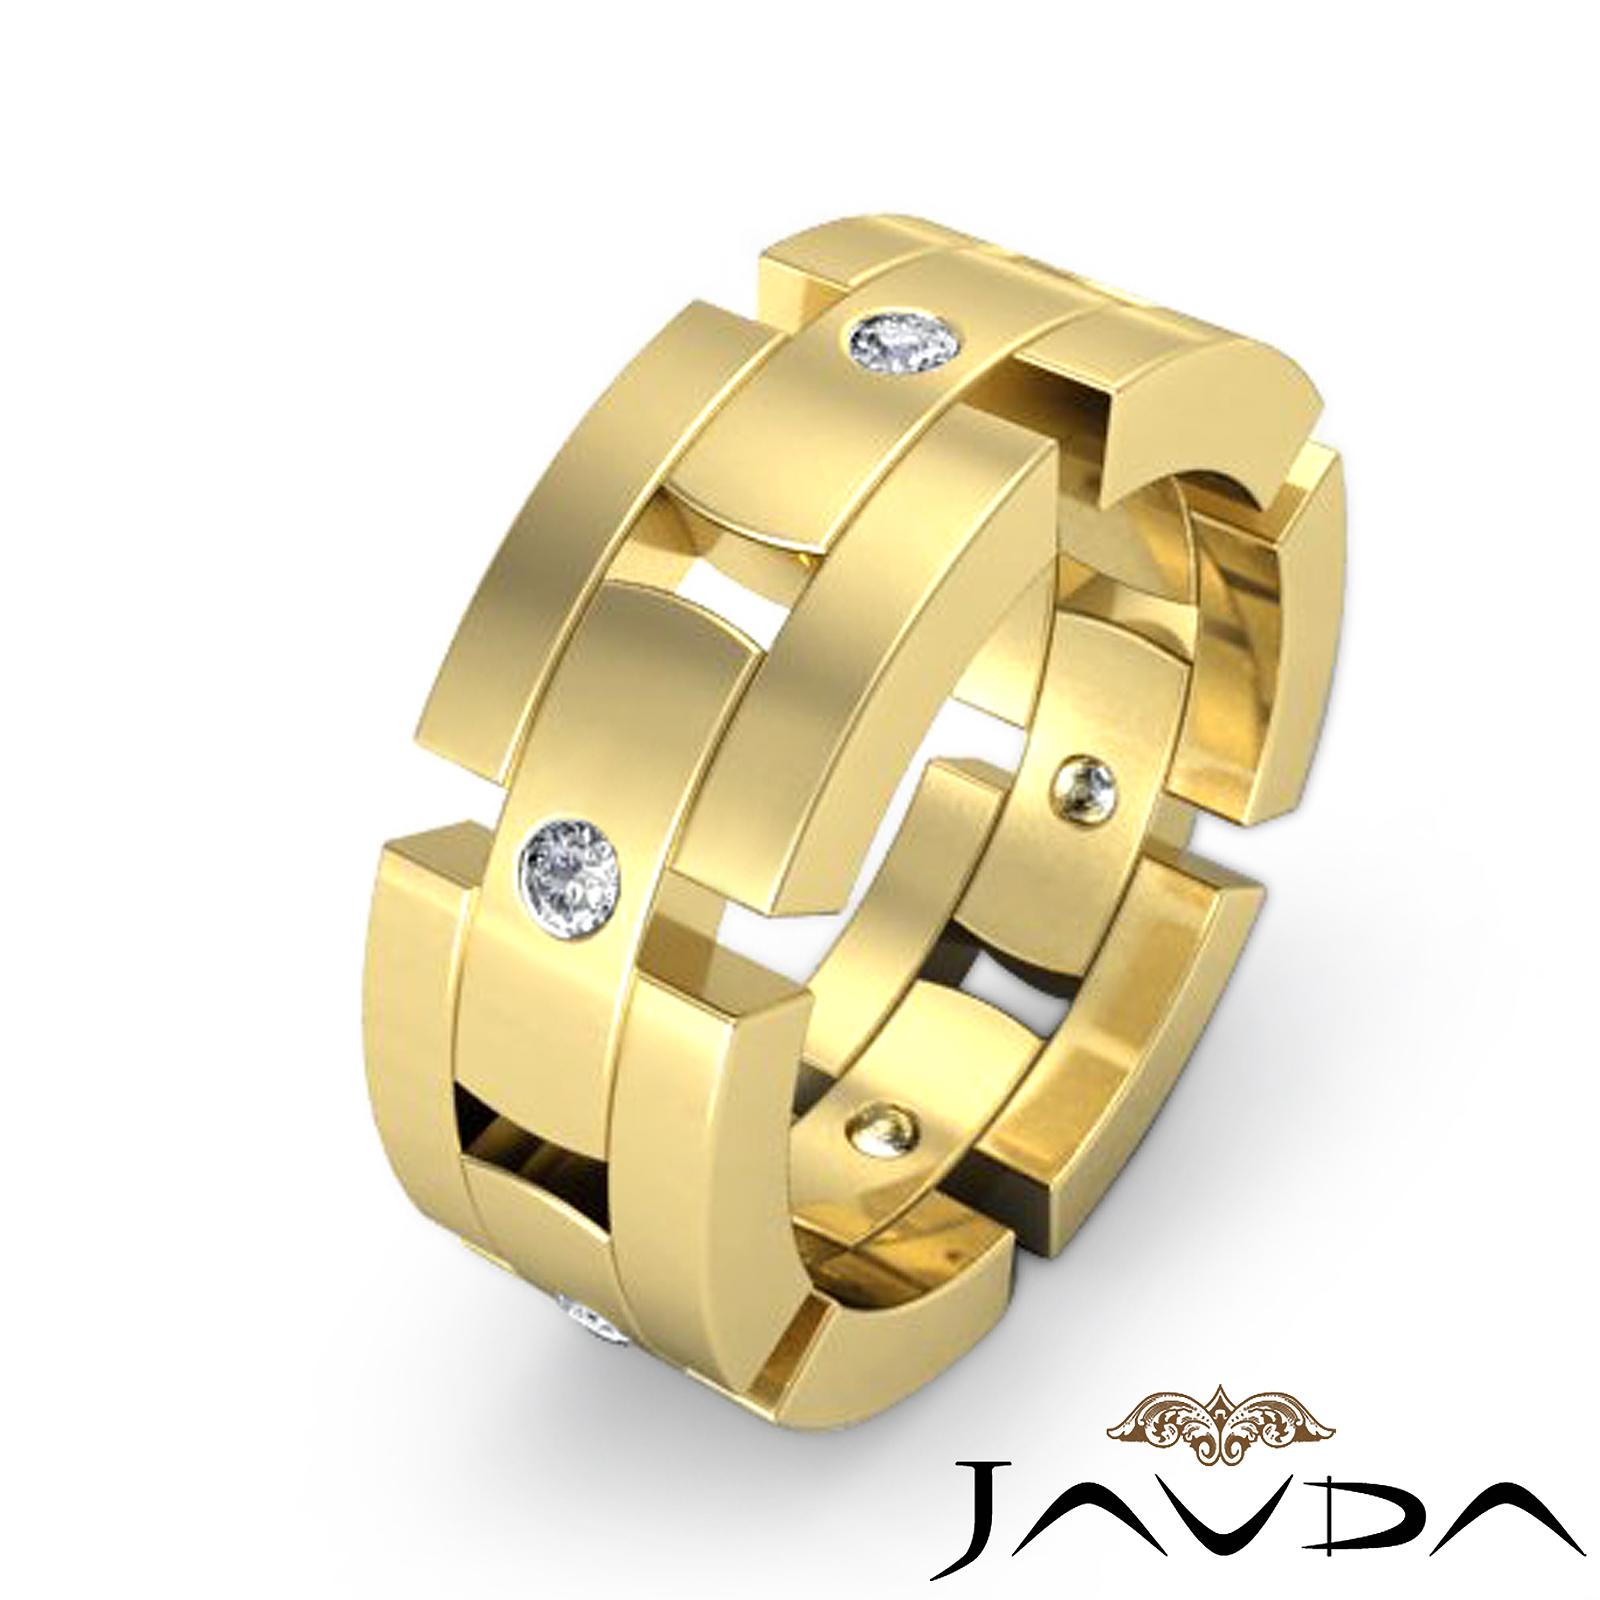 mens block link eternity wedding band round diamond ring 14k yellow gold 0 35ct ebay. Black Bedroom Furniture Sets. Home Design Ideas